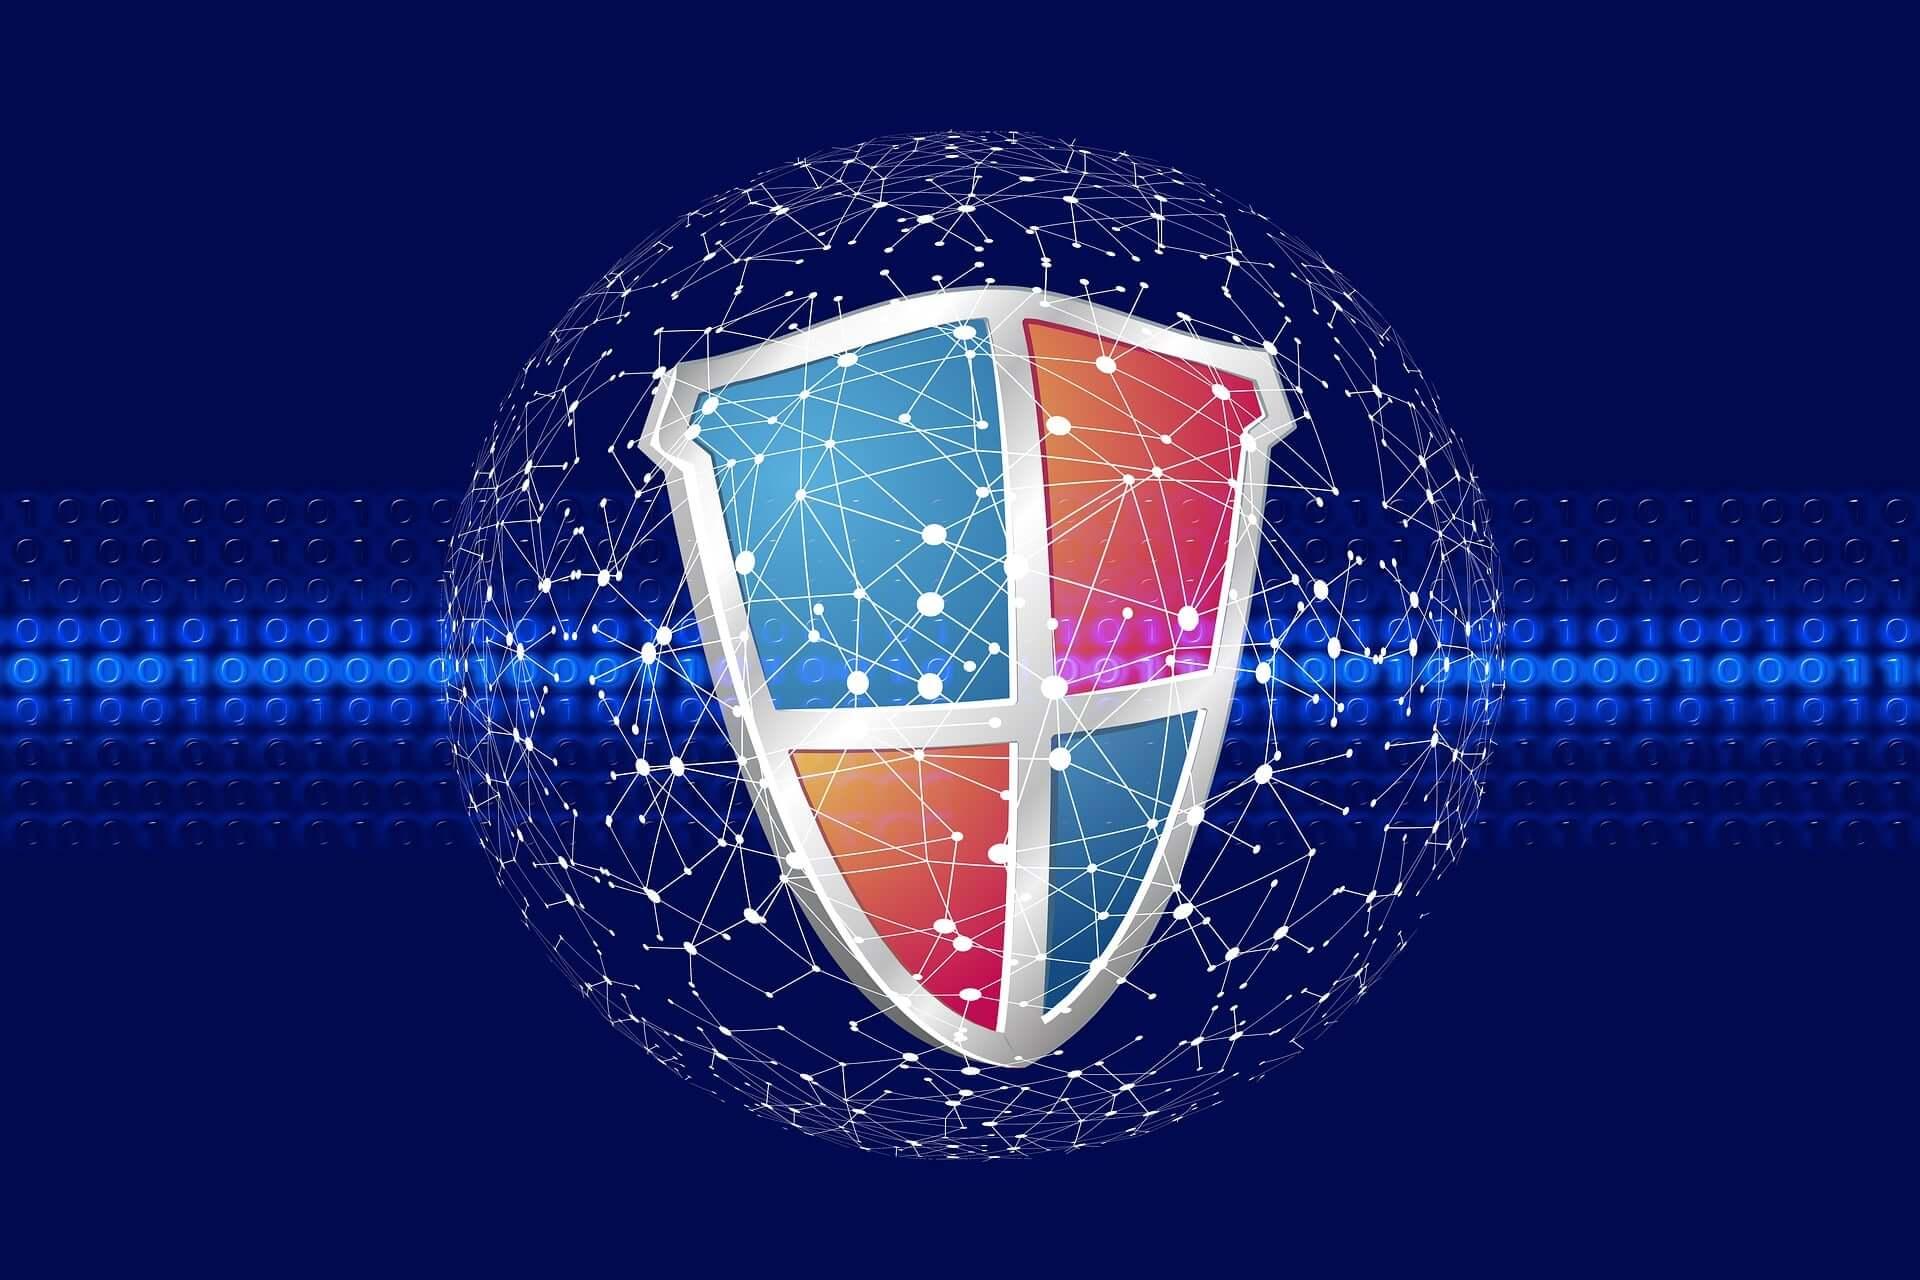 tipsfu privacy po.l.i.cy